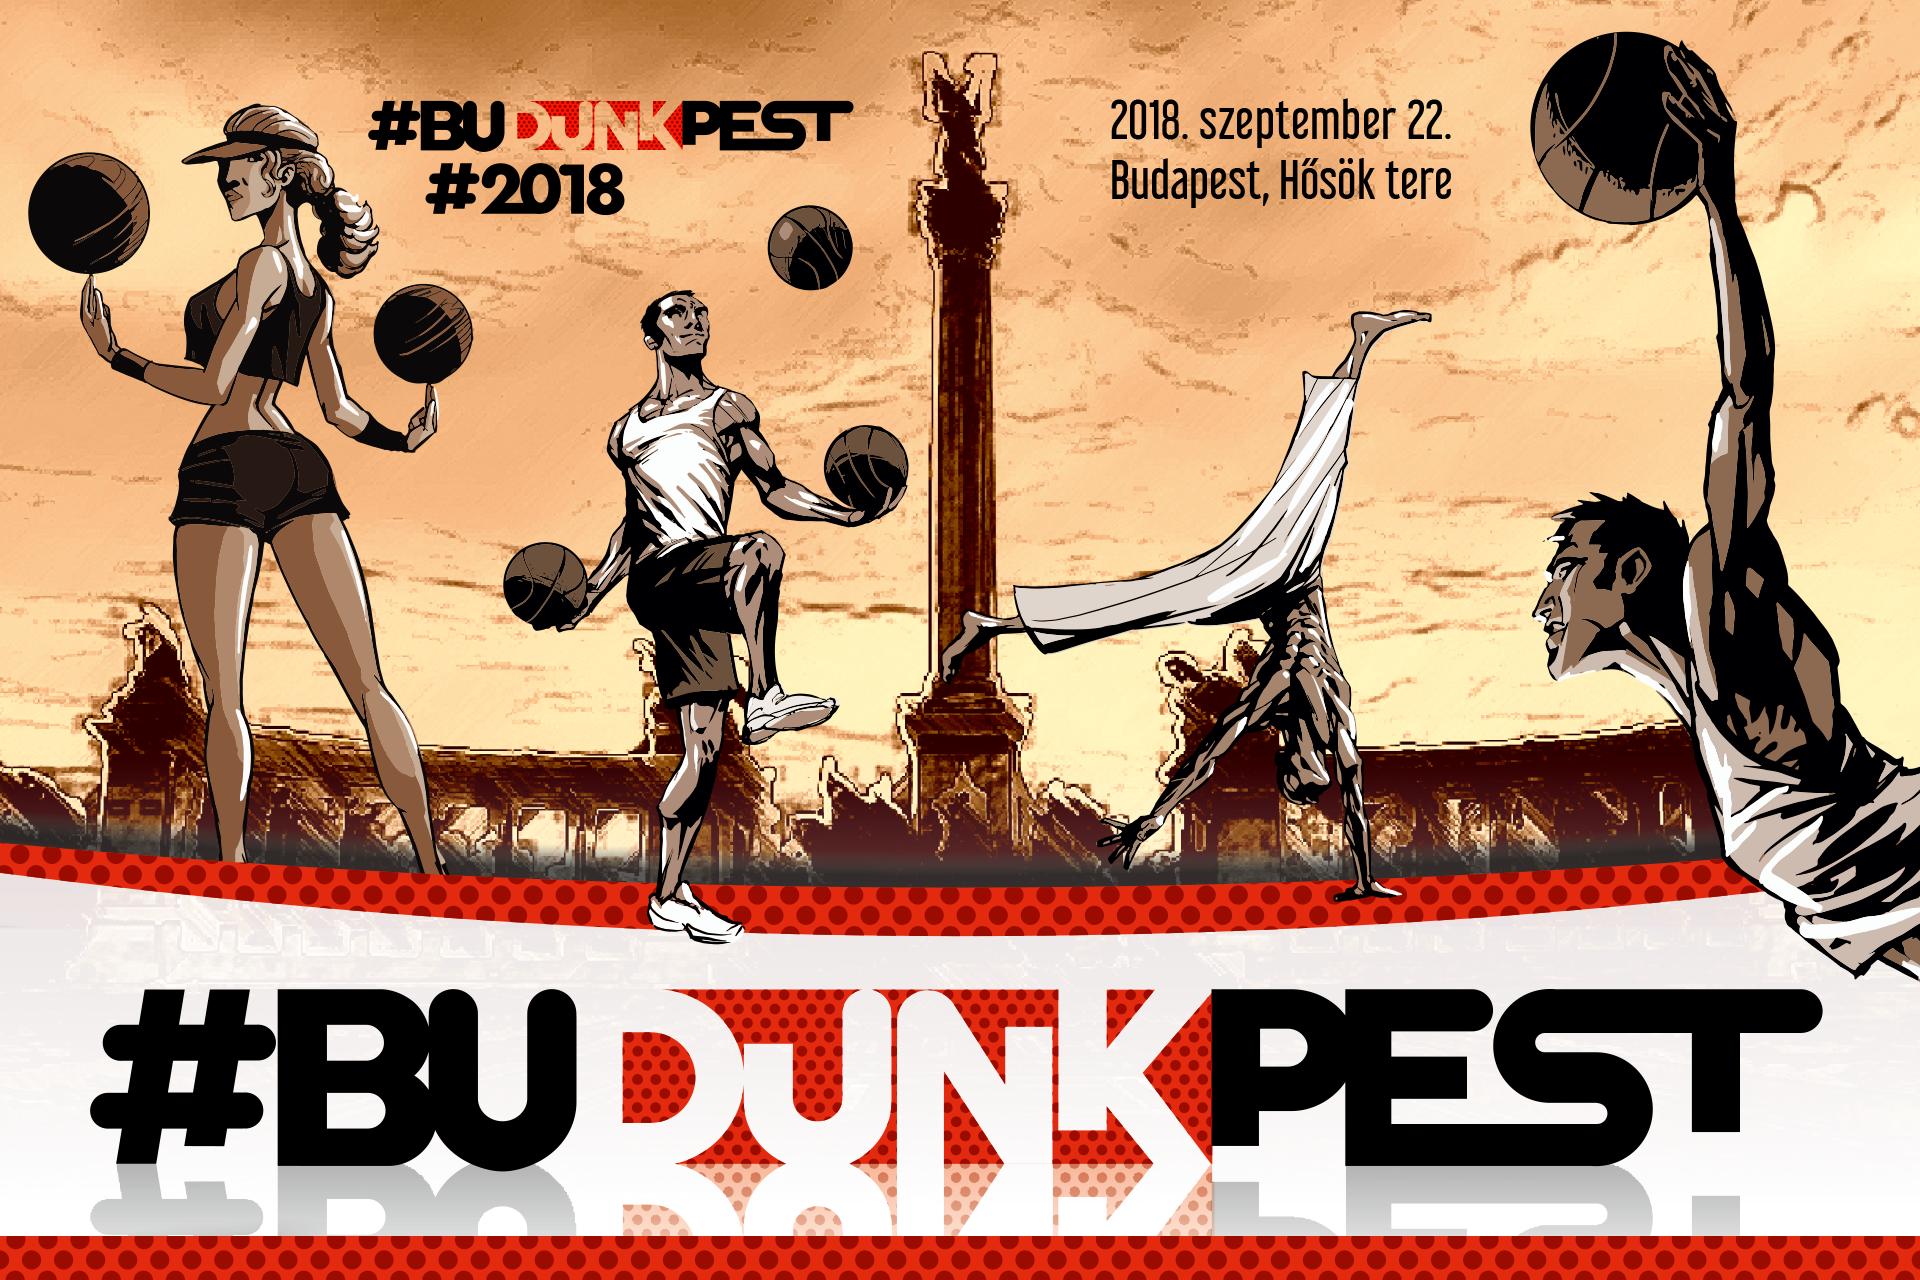 #budunkpest